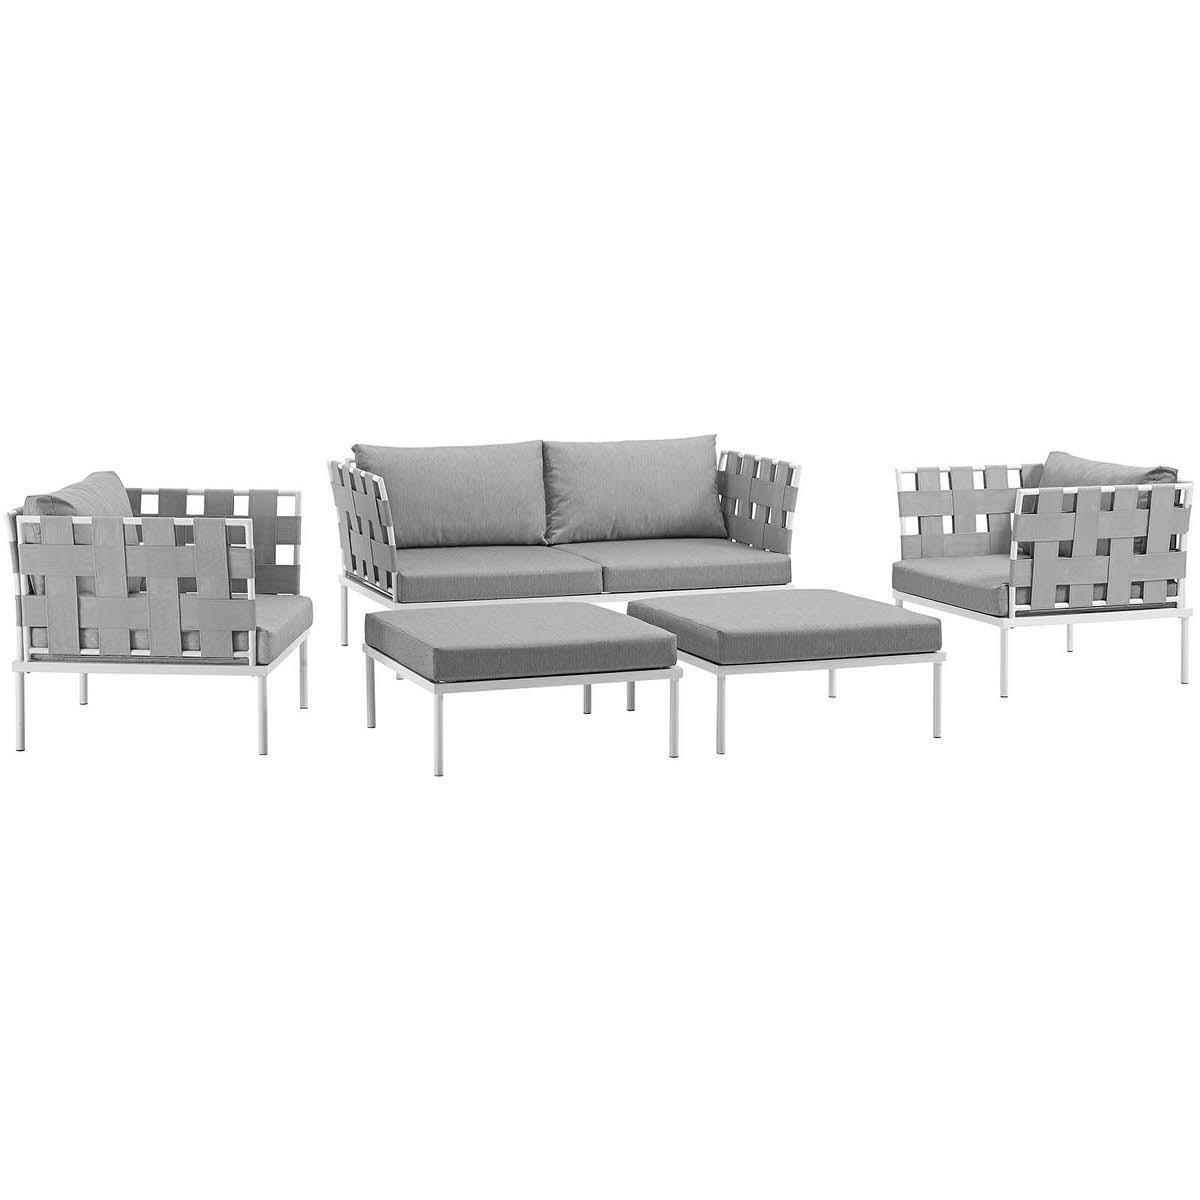 Harmony 5 Piece Outdoor Patio Aluminum Sectional Sofa Set White Gray ...